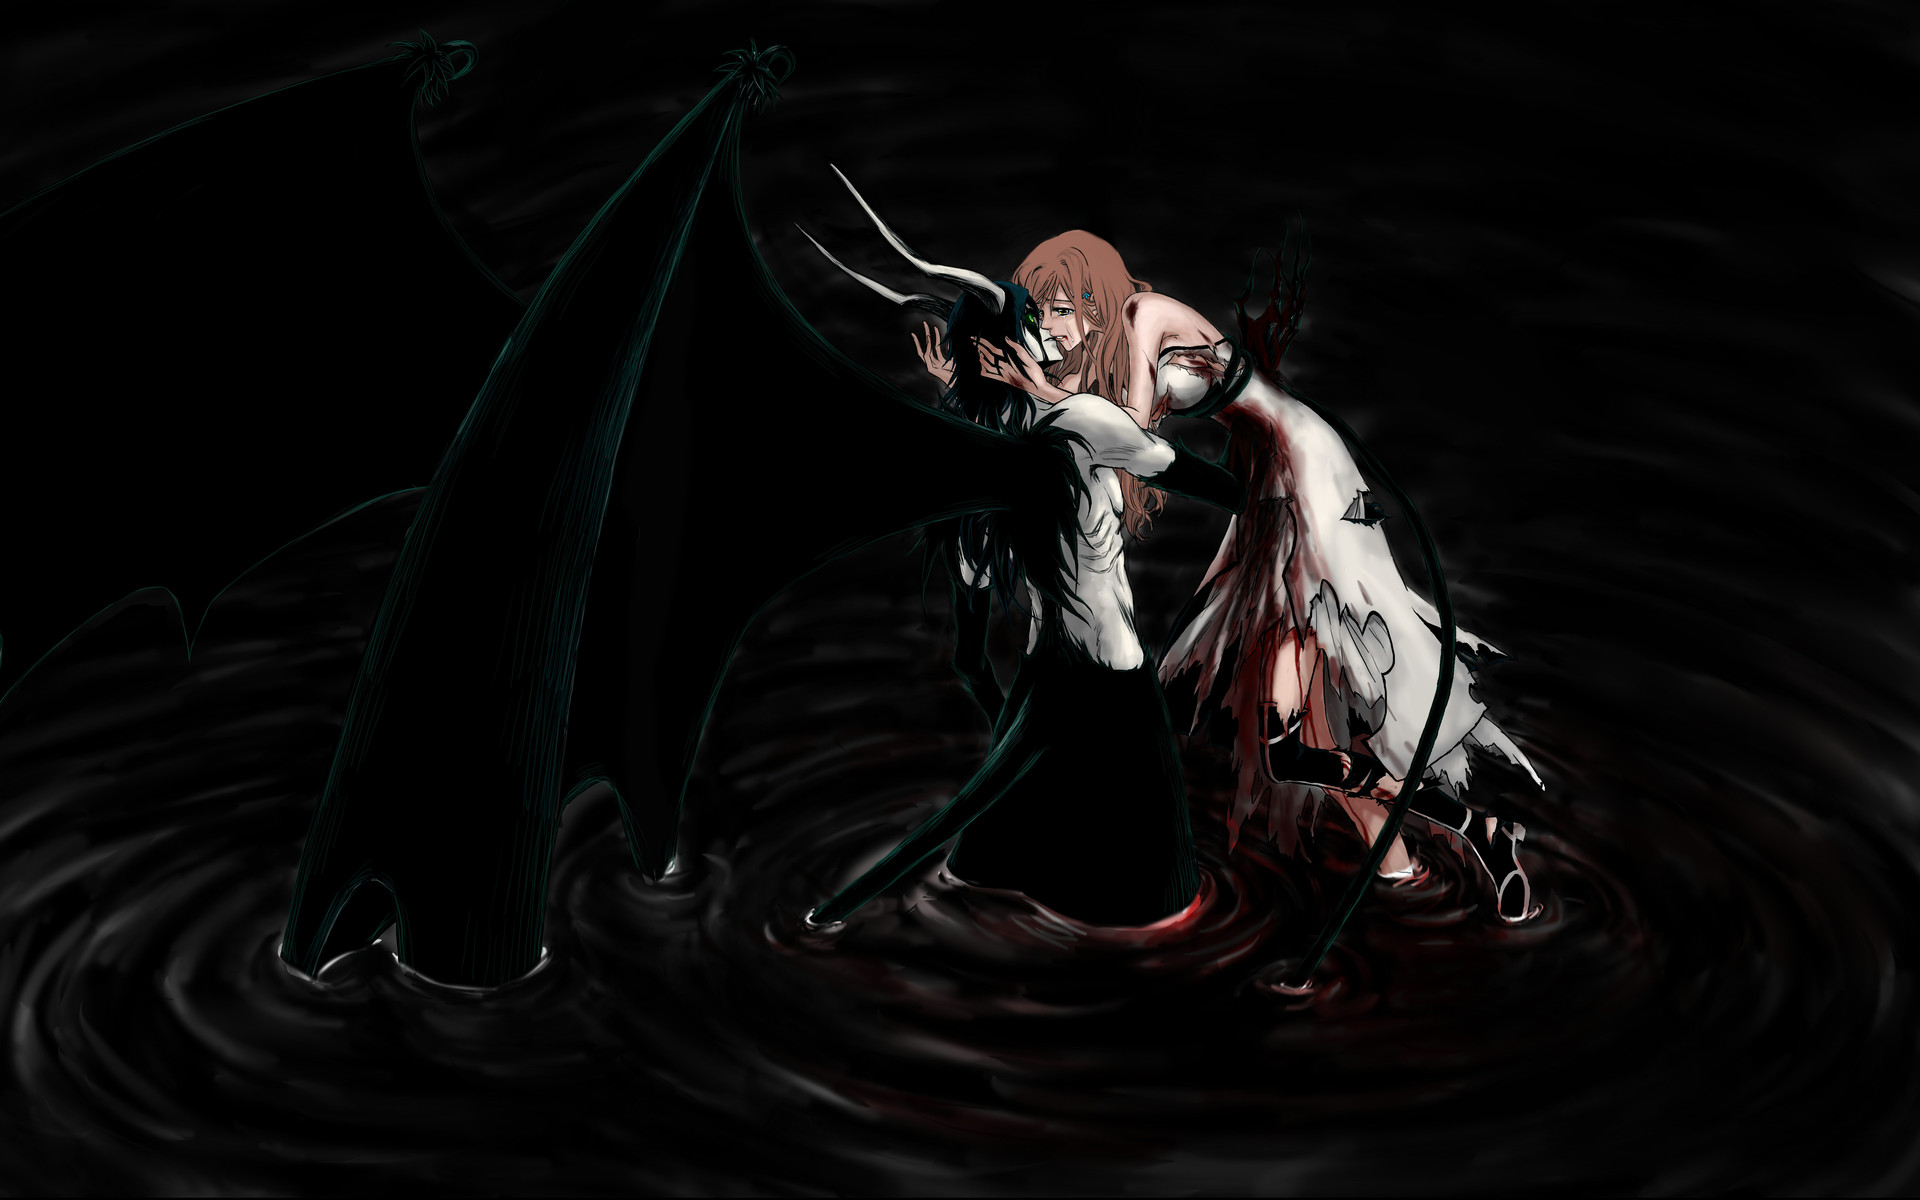 Free Download Anime Bleach Dark Demons Love Romance Kissing